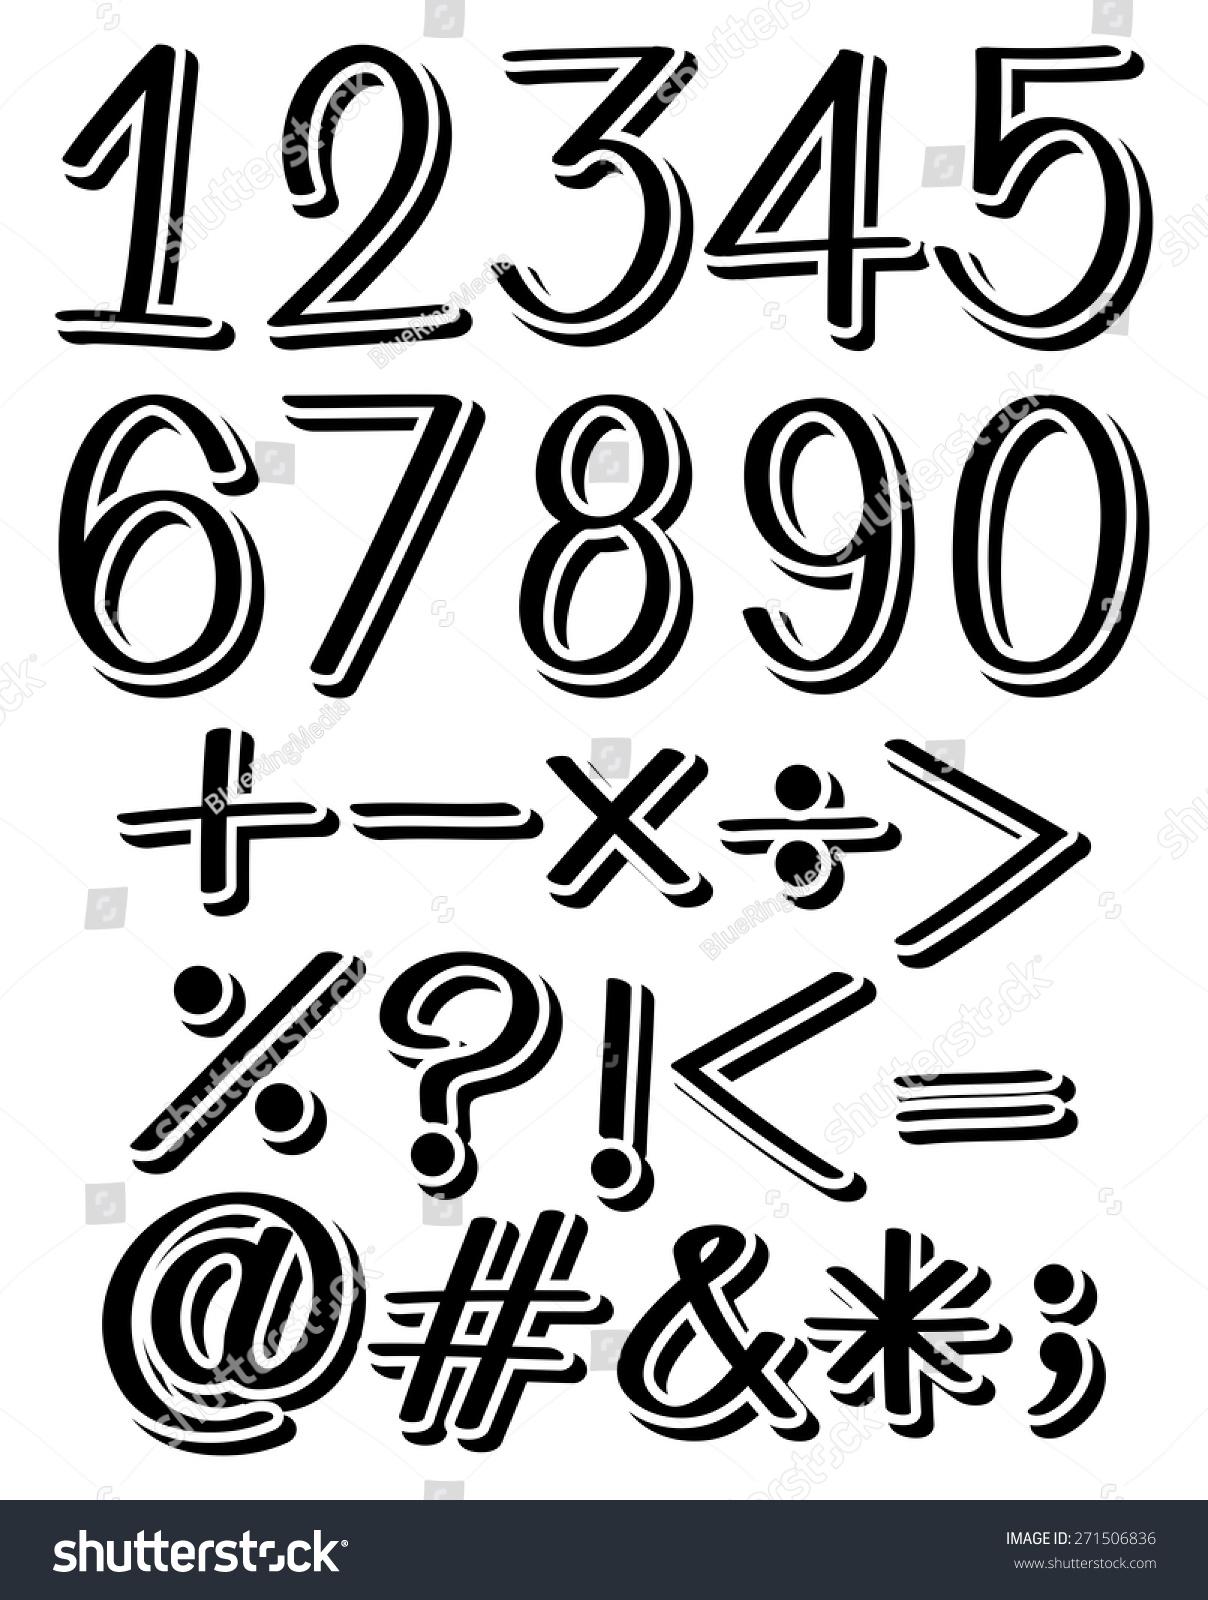 Set numbers maths symbols black color stock vector 271506836 set of numbers and maths symbols in black color buycottarizona